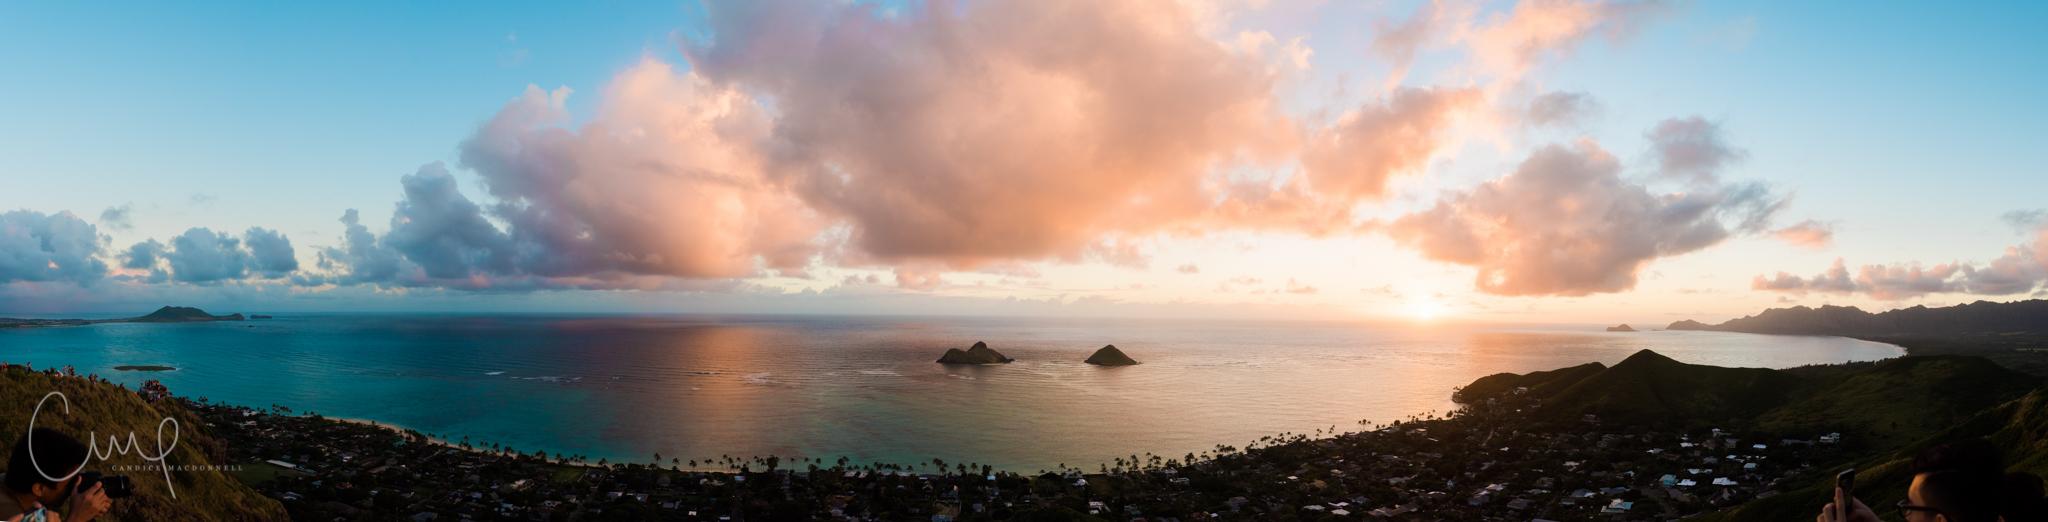 panoramic pano lanikai sunrise from pillboxes oahu hawaii lifestyle photographer